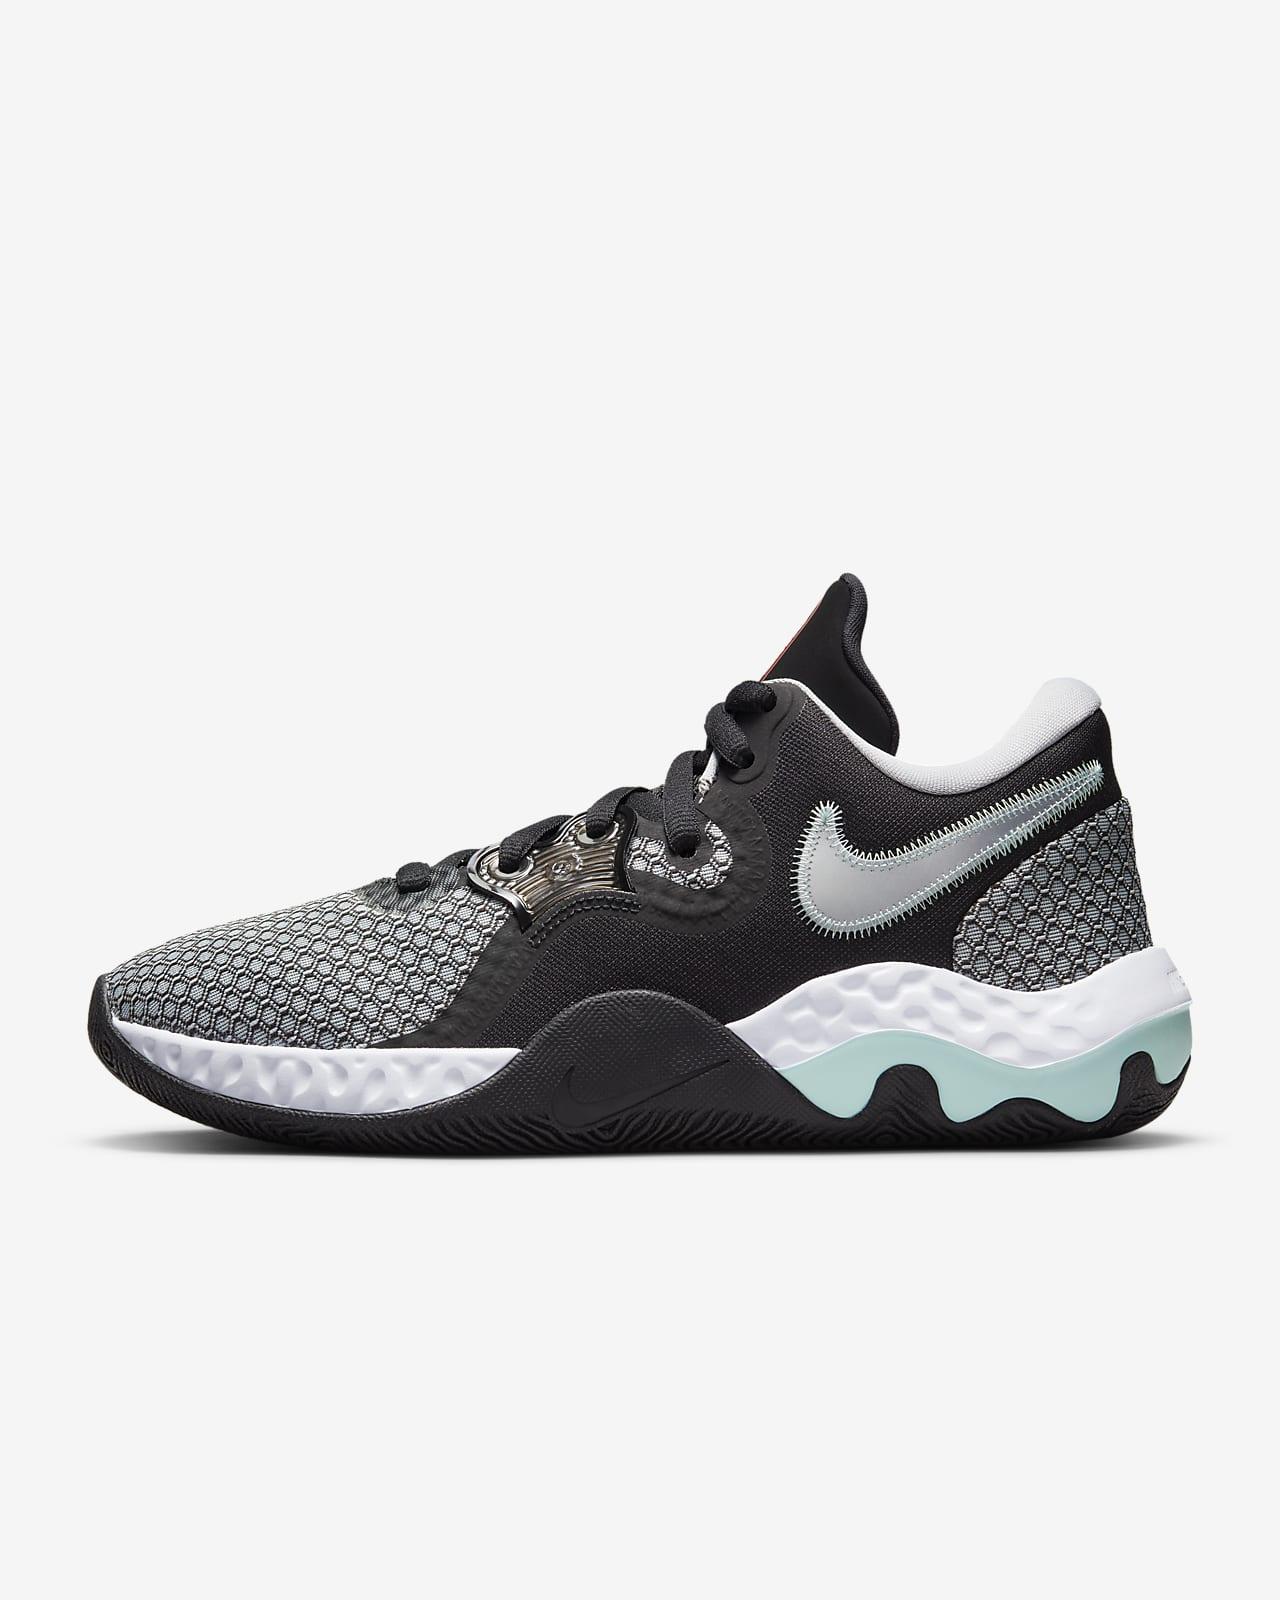 Calzado de básquetbol Nike Renew Elevate 2